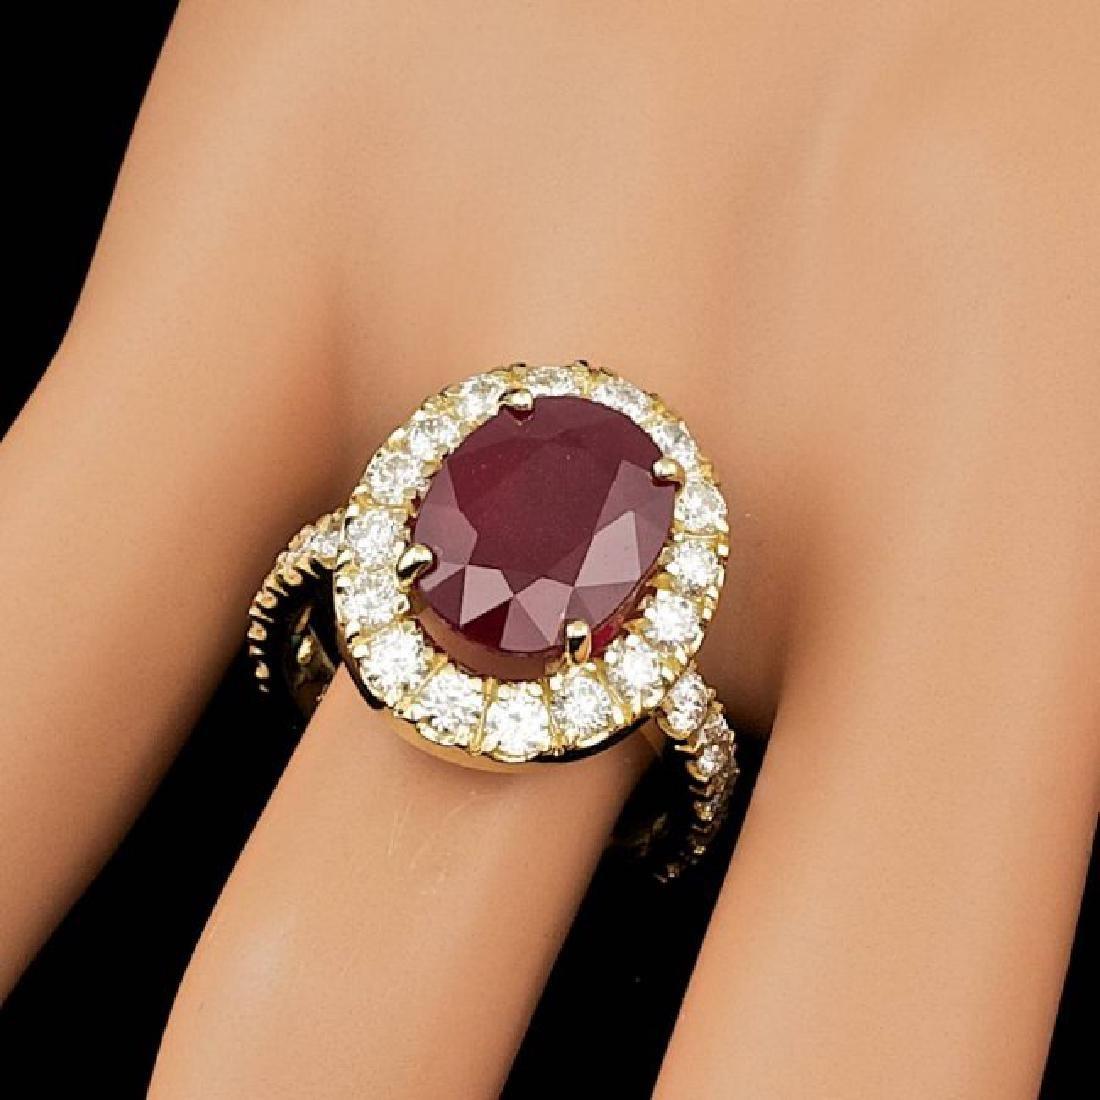 14k Yellow Gold 7.50ct Ruby 1.70ct Diamond Ring - 3